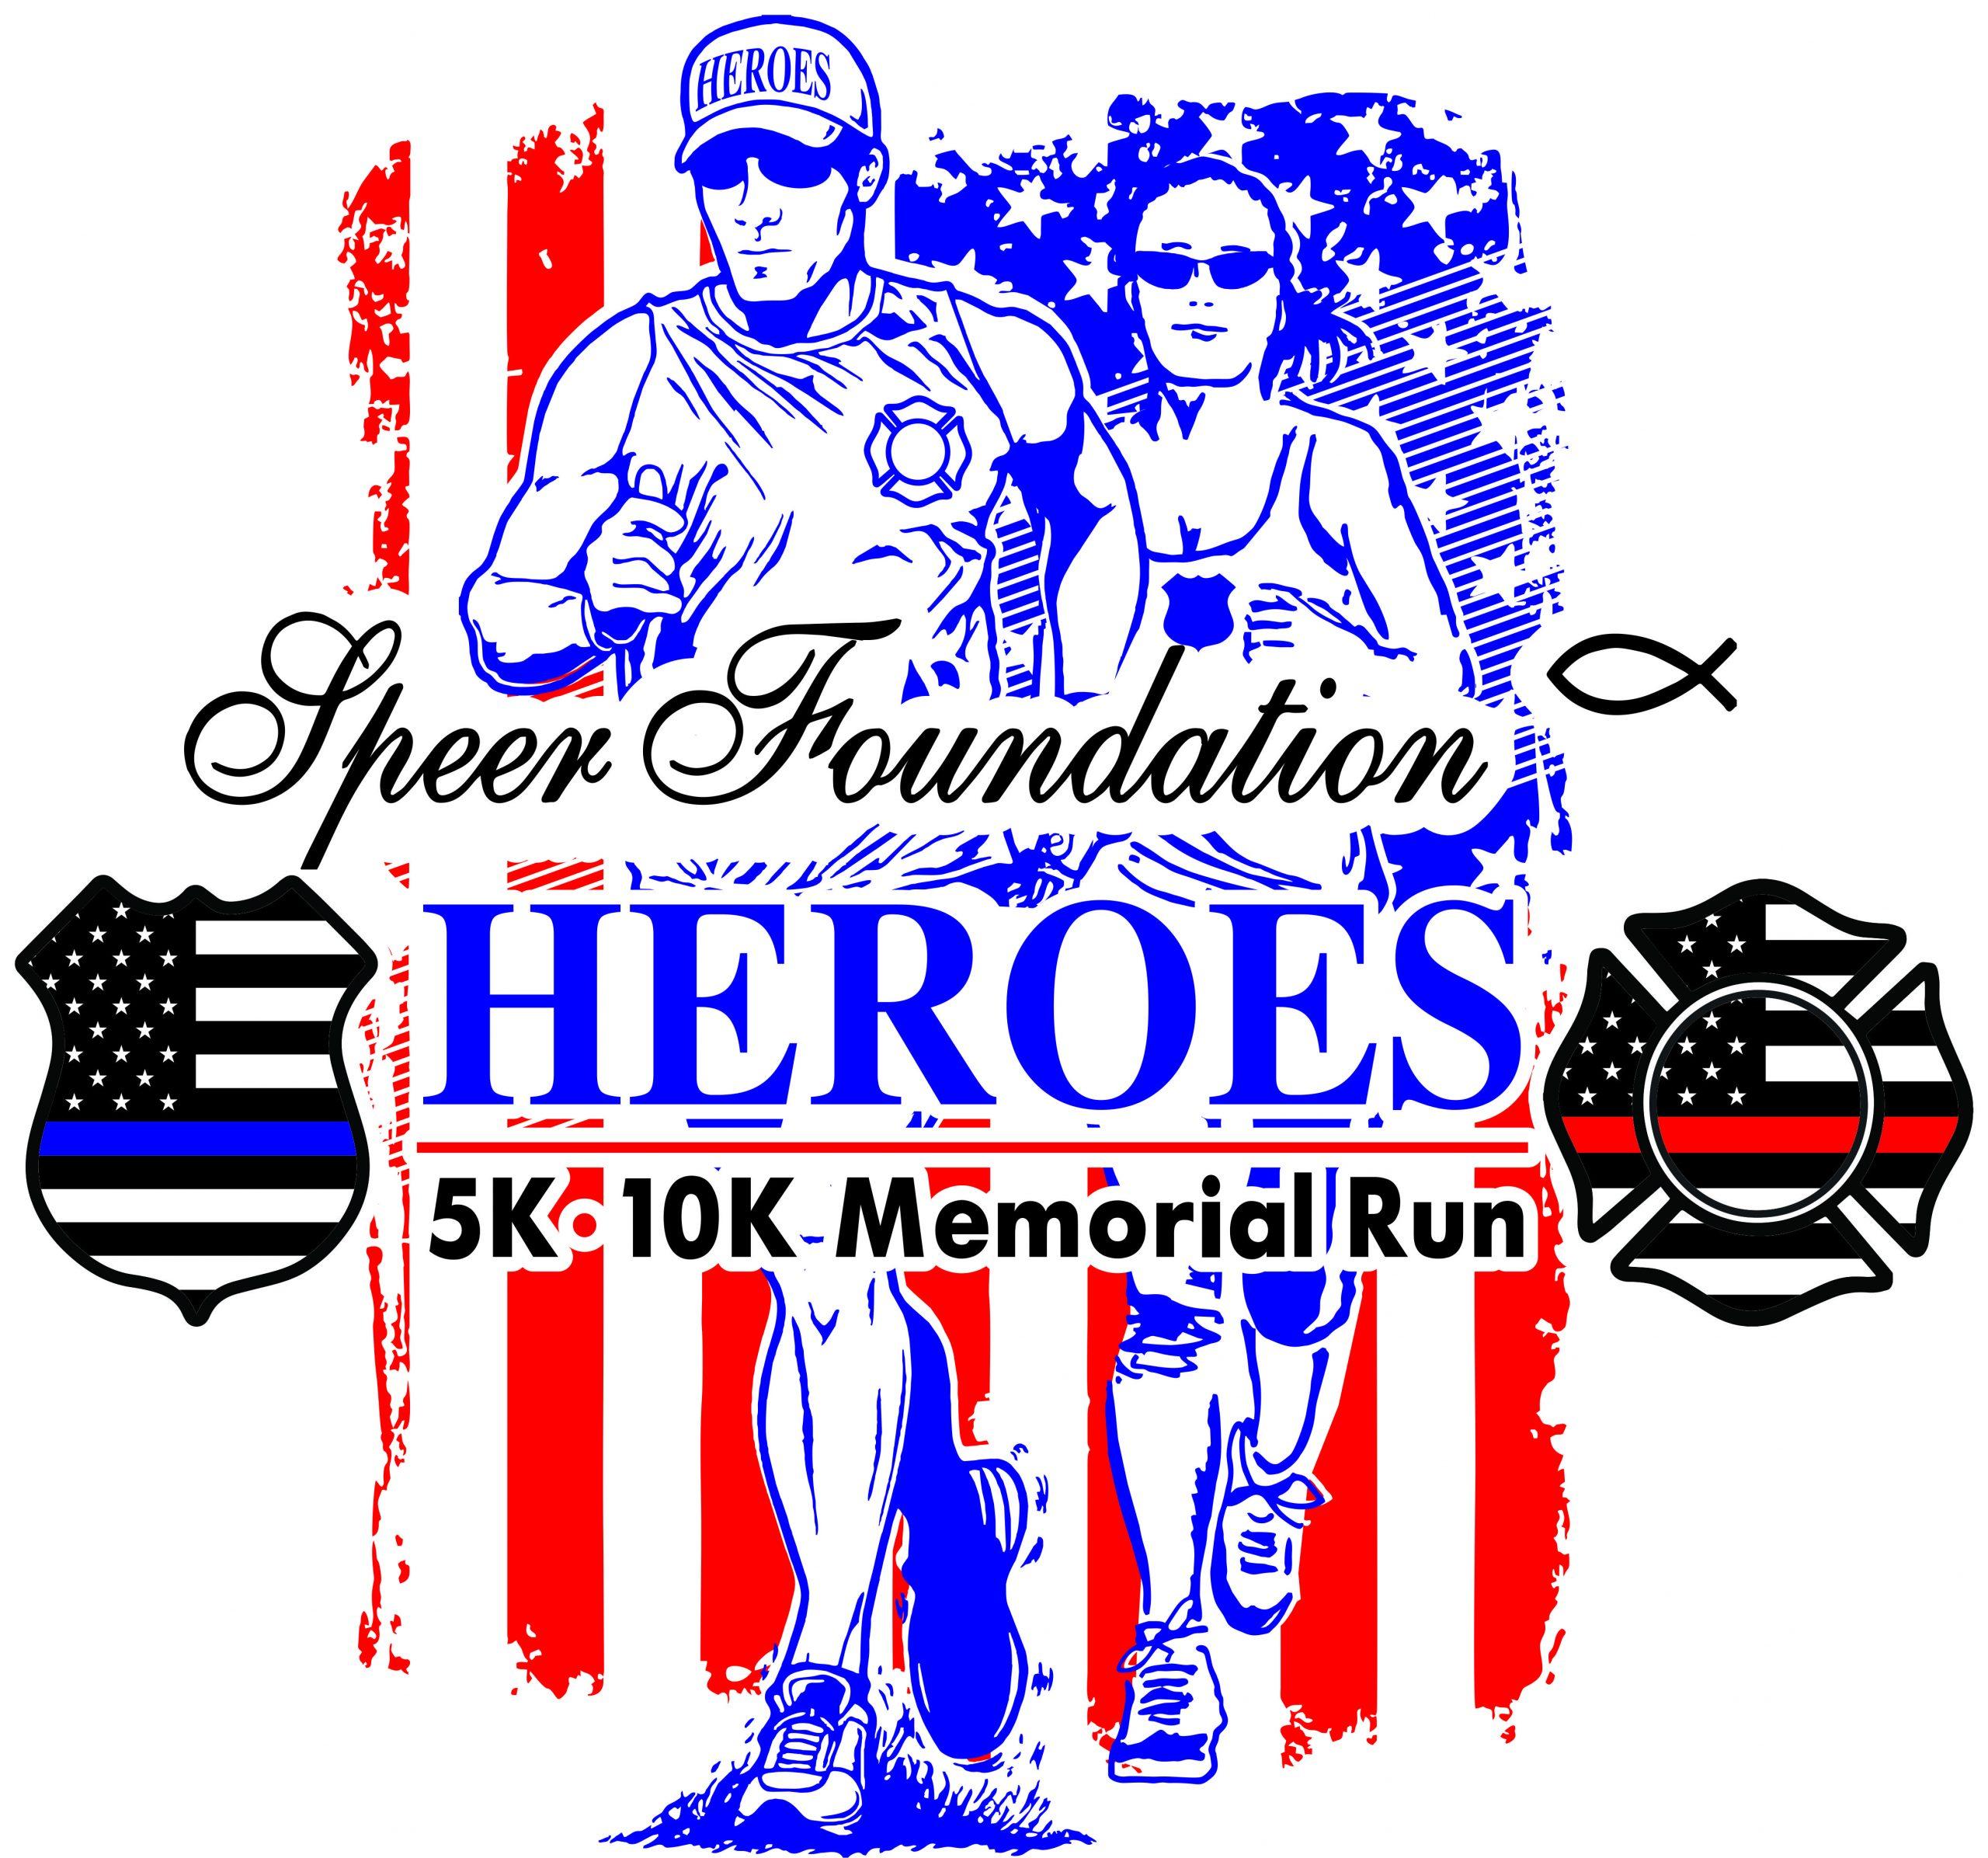 Register For The Heroes Twilight Run